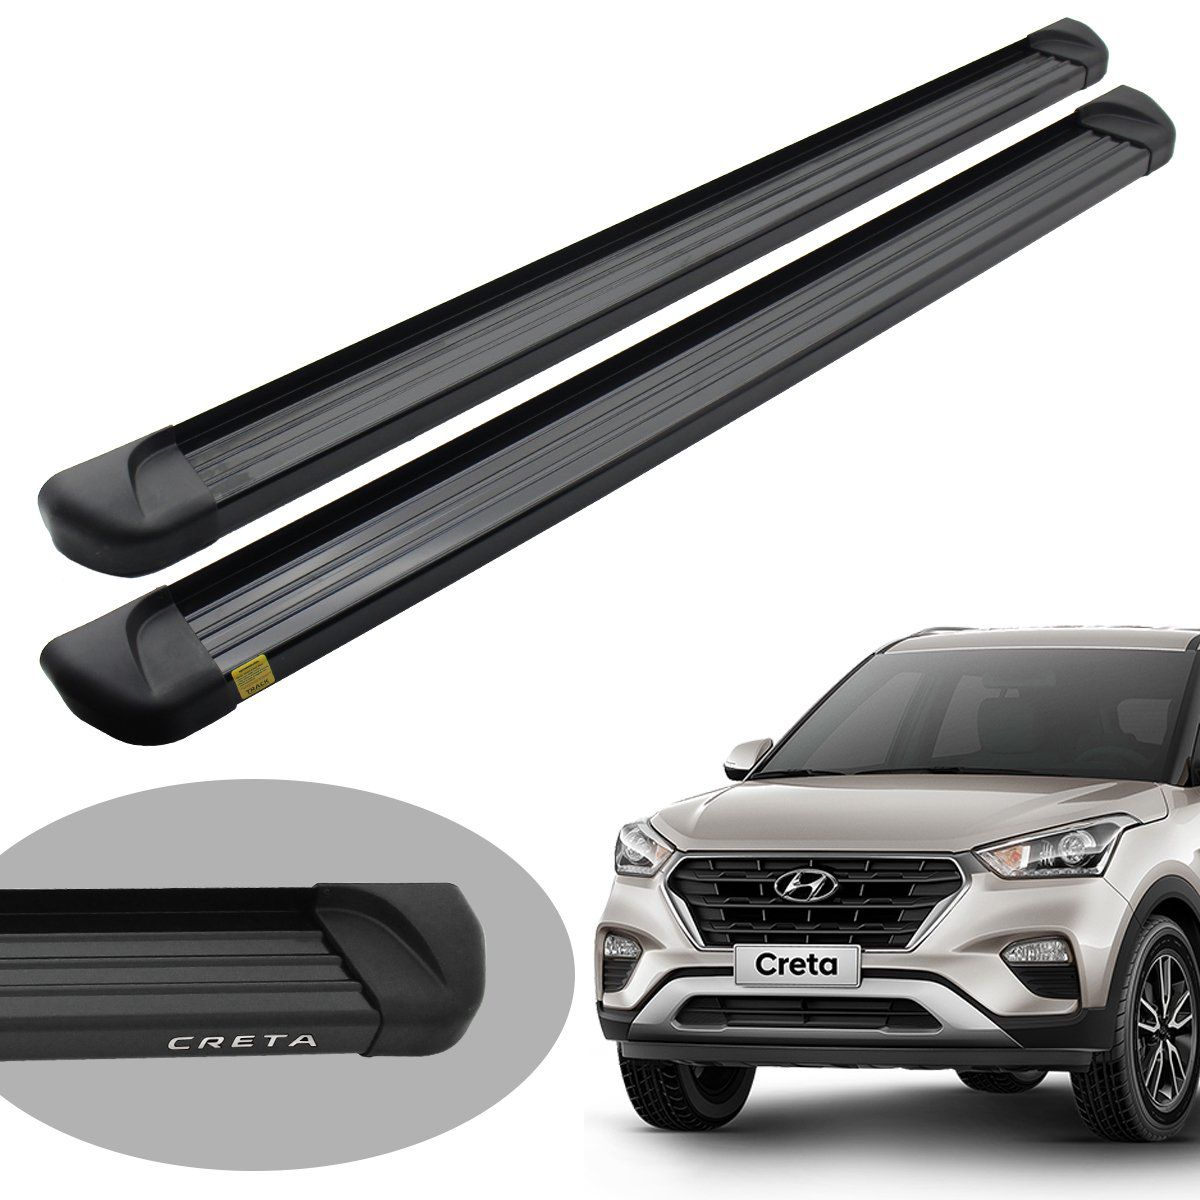 Estribo Track plataforma alumínio preto Hyundai Creta 2017 a 2021